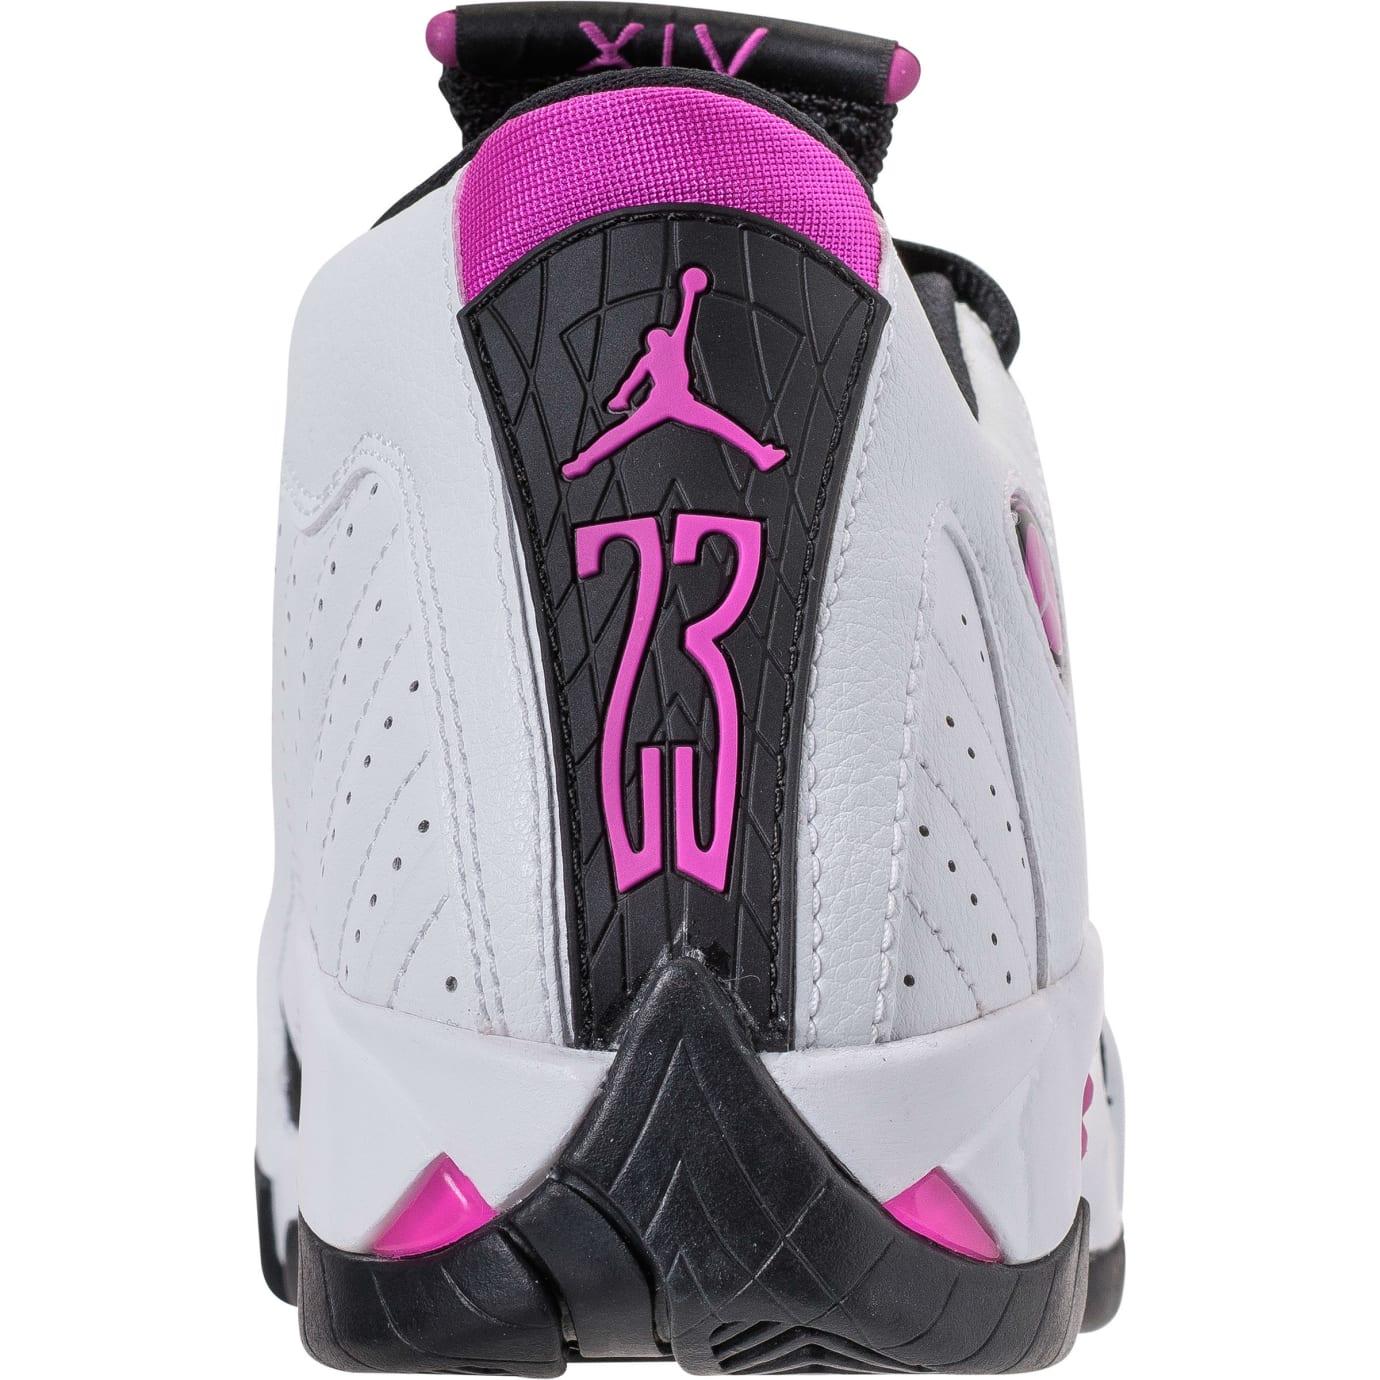 e186e984b52ace Air Jordan 14 XIV Girls Fuchsia Blast Release Date 654969-110 Heel